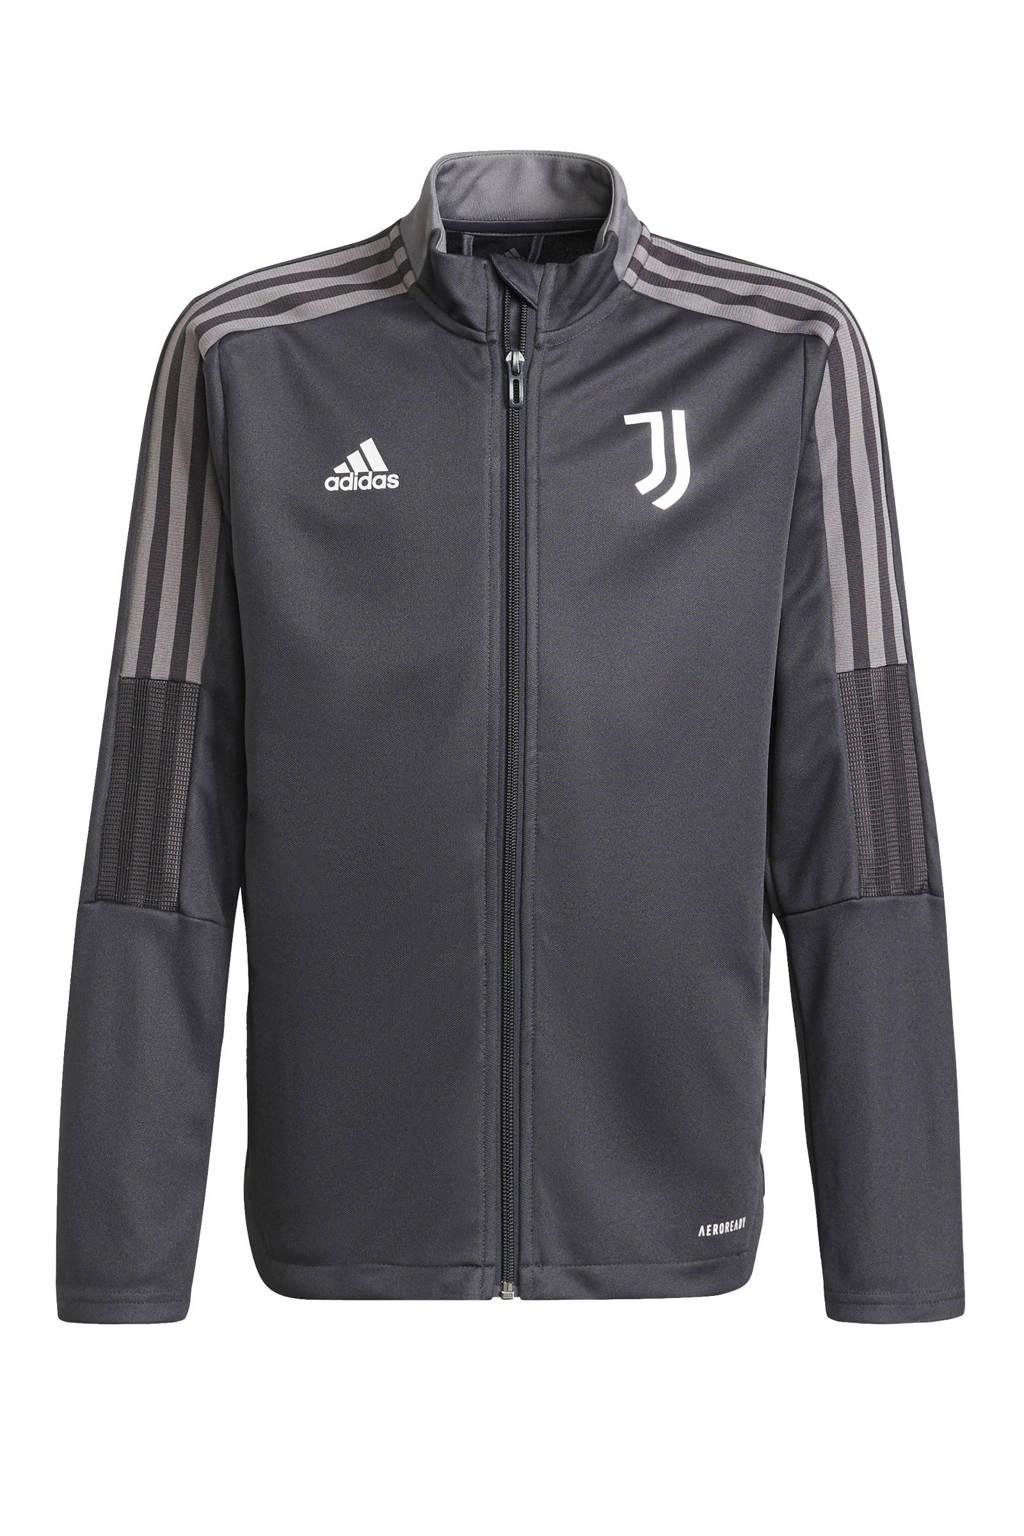 adidas Performance Junior Juventus FC trainingspak, Grijs/zwart